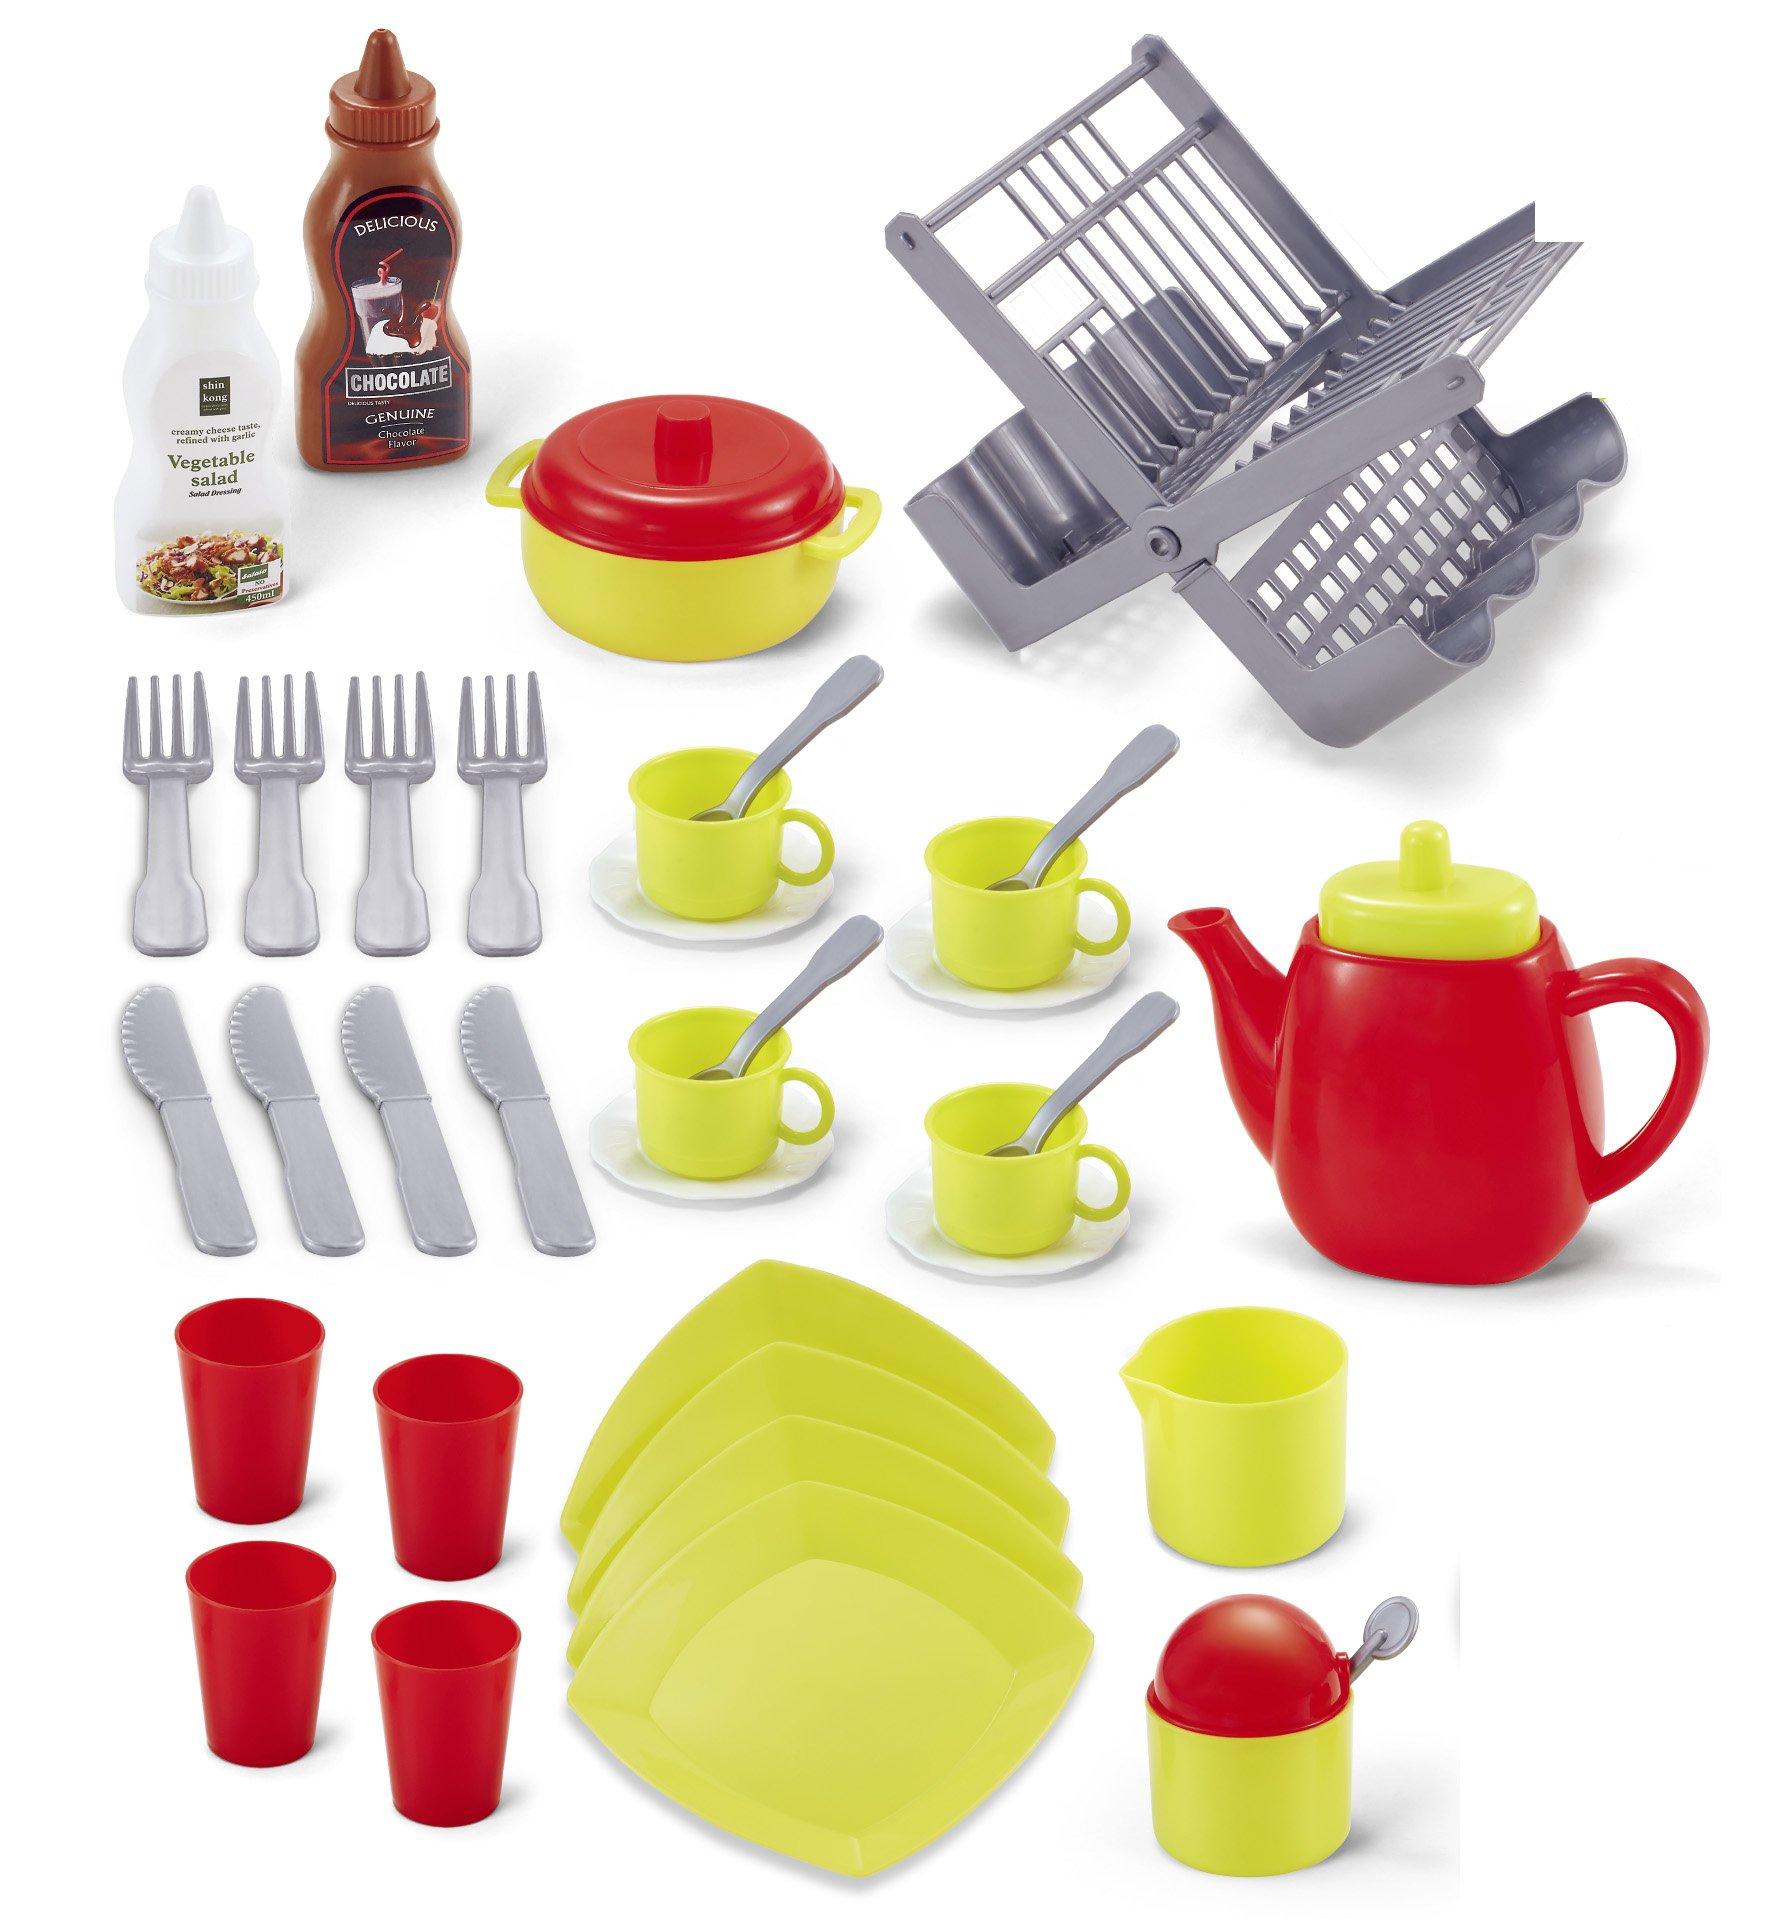 Genius Art TeaPot Set for Little Girls - Kids Kitchen Accessories - Pretend Play Toy Tea Pot Party 2018 Edition